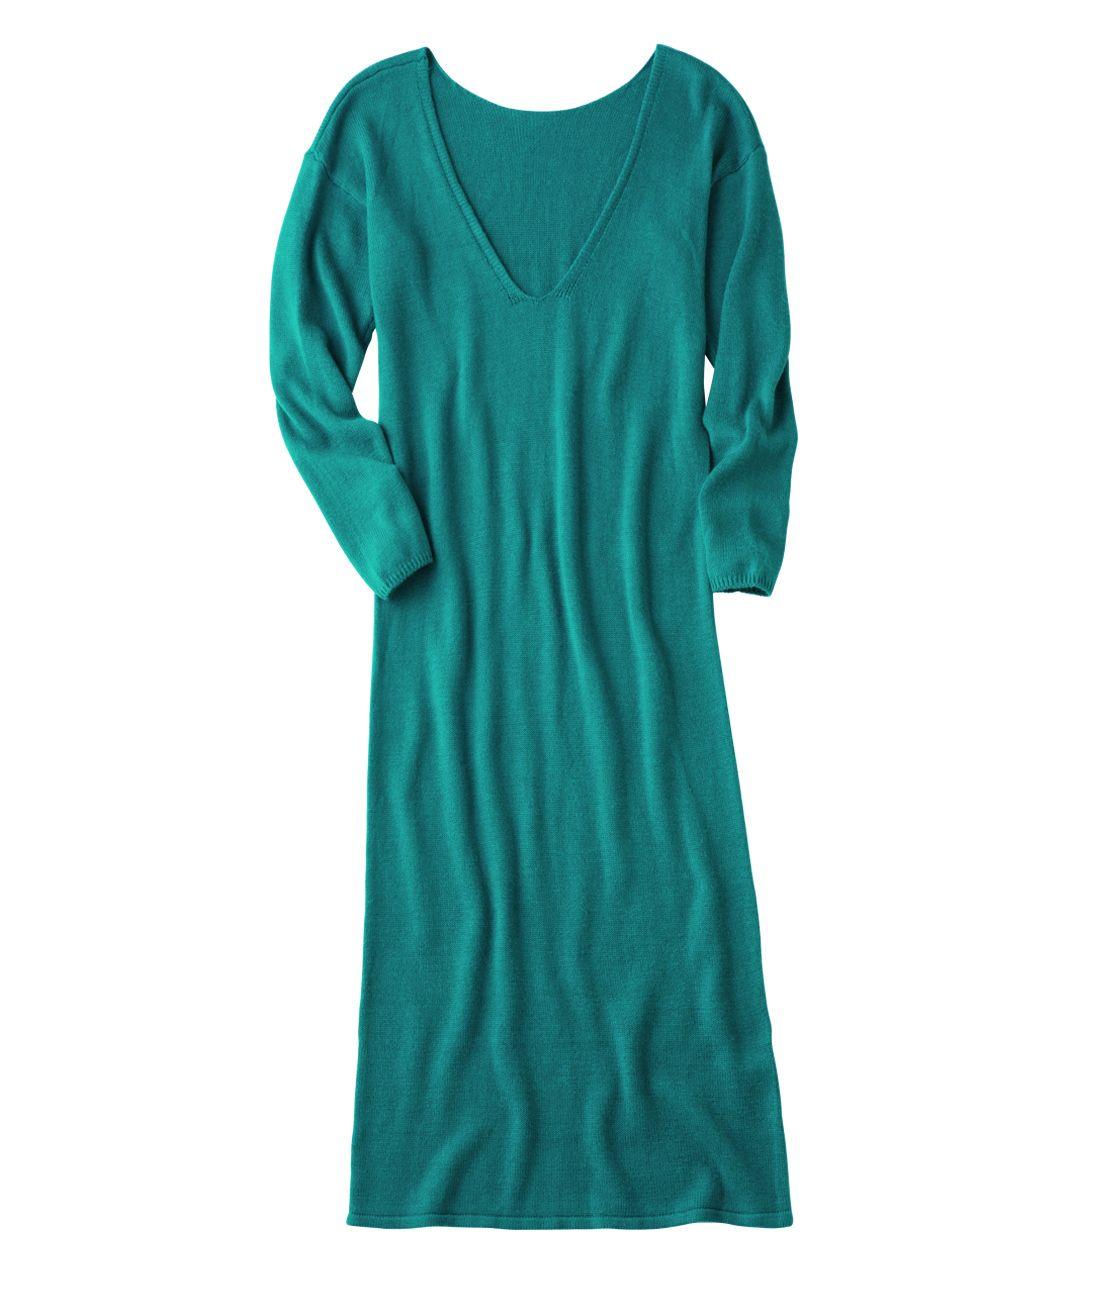 Luxe Knit 2WAY dress